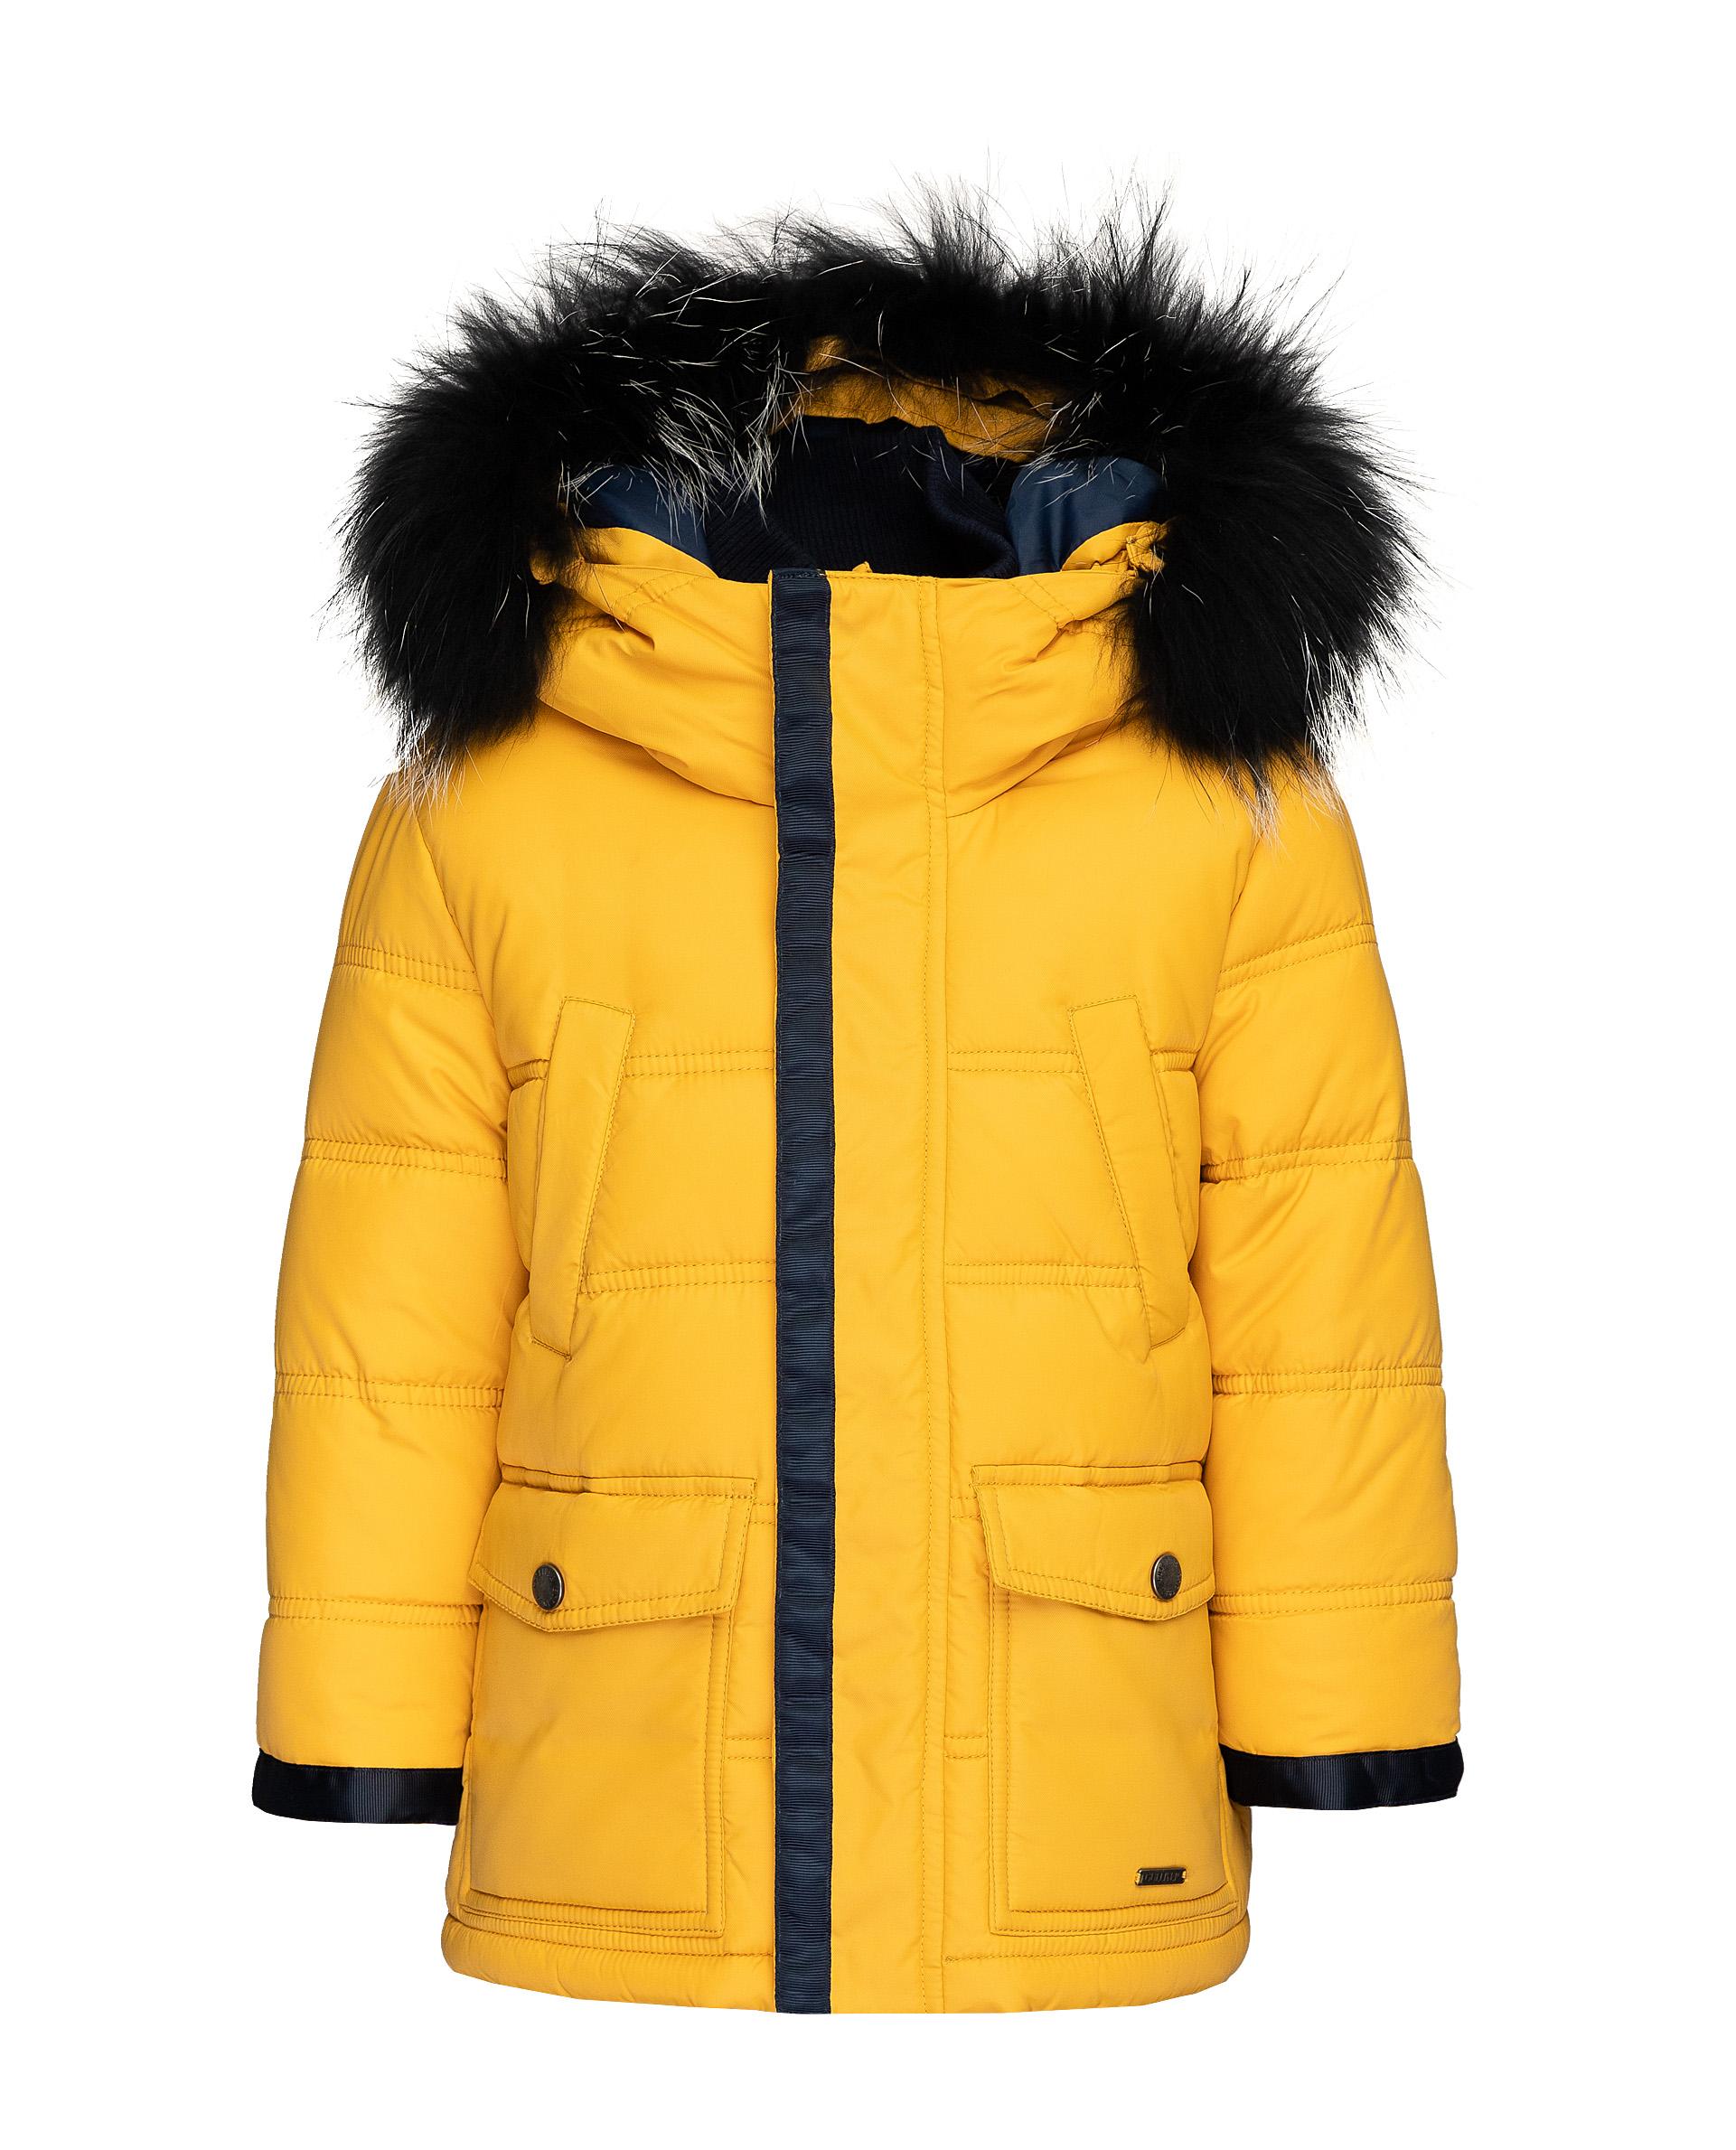 Купить 21904BMC4104, Желтая зимняя куртка Gulliver, желтый, 98, Мужской, ОСЕНЬ/ЗИМА 2019-2020 (shop: GulliverMarket Gulliver Market)